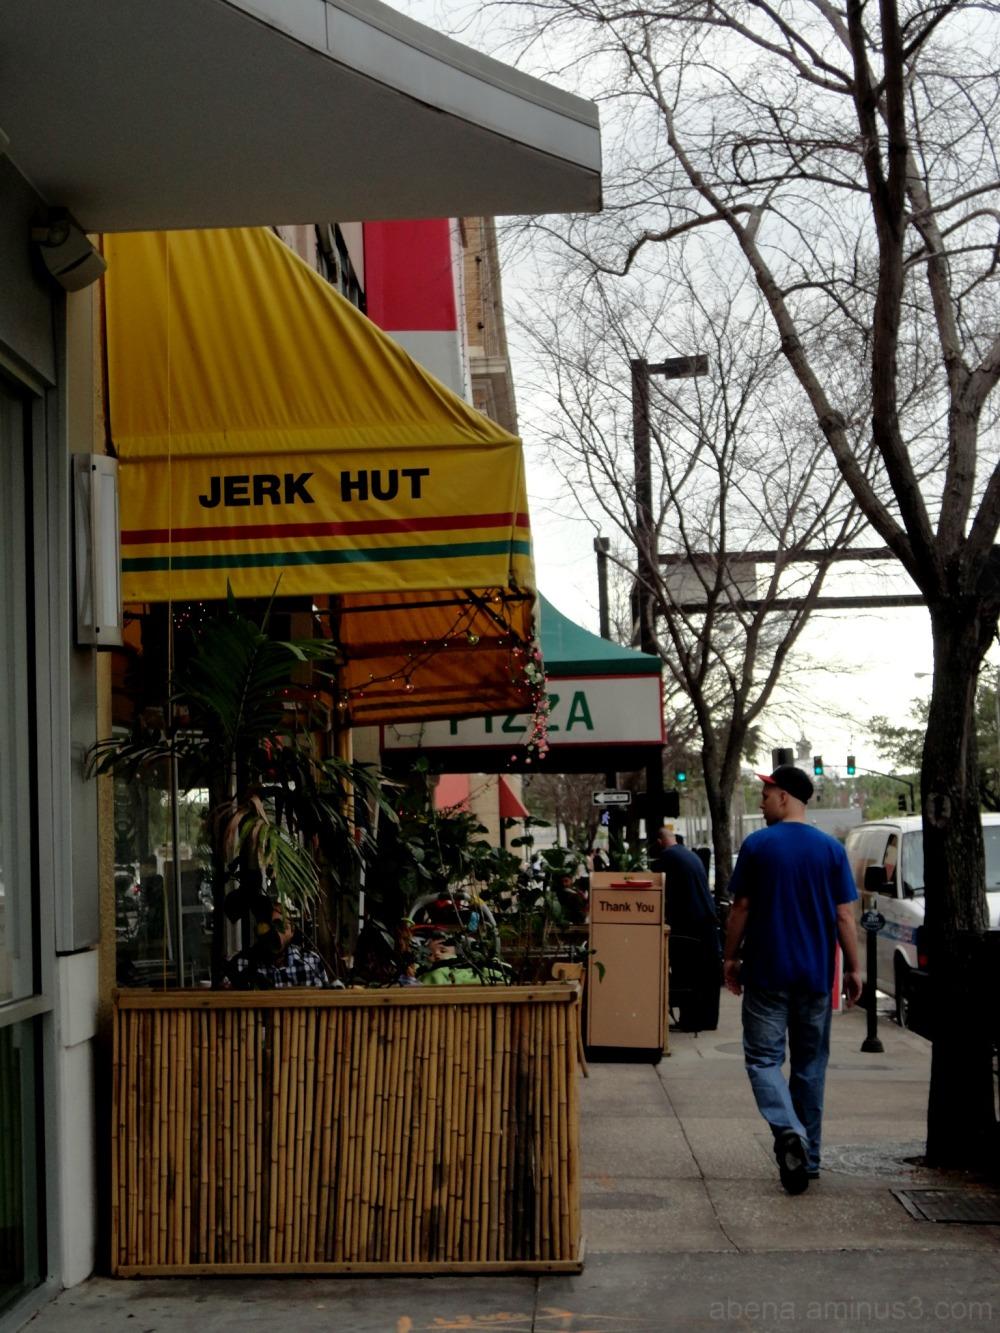 Jerk hut ;)